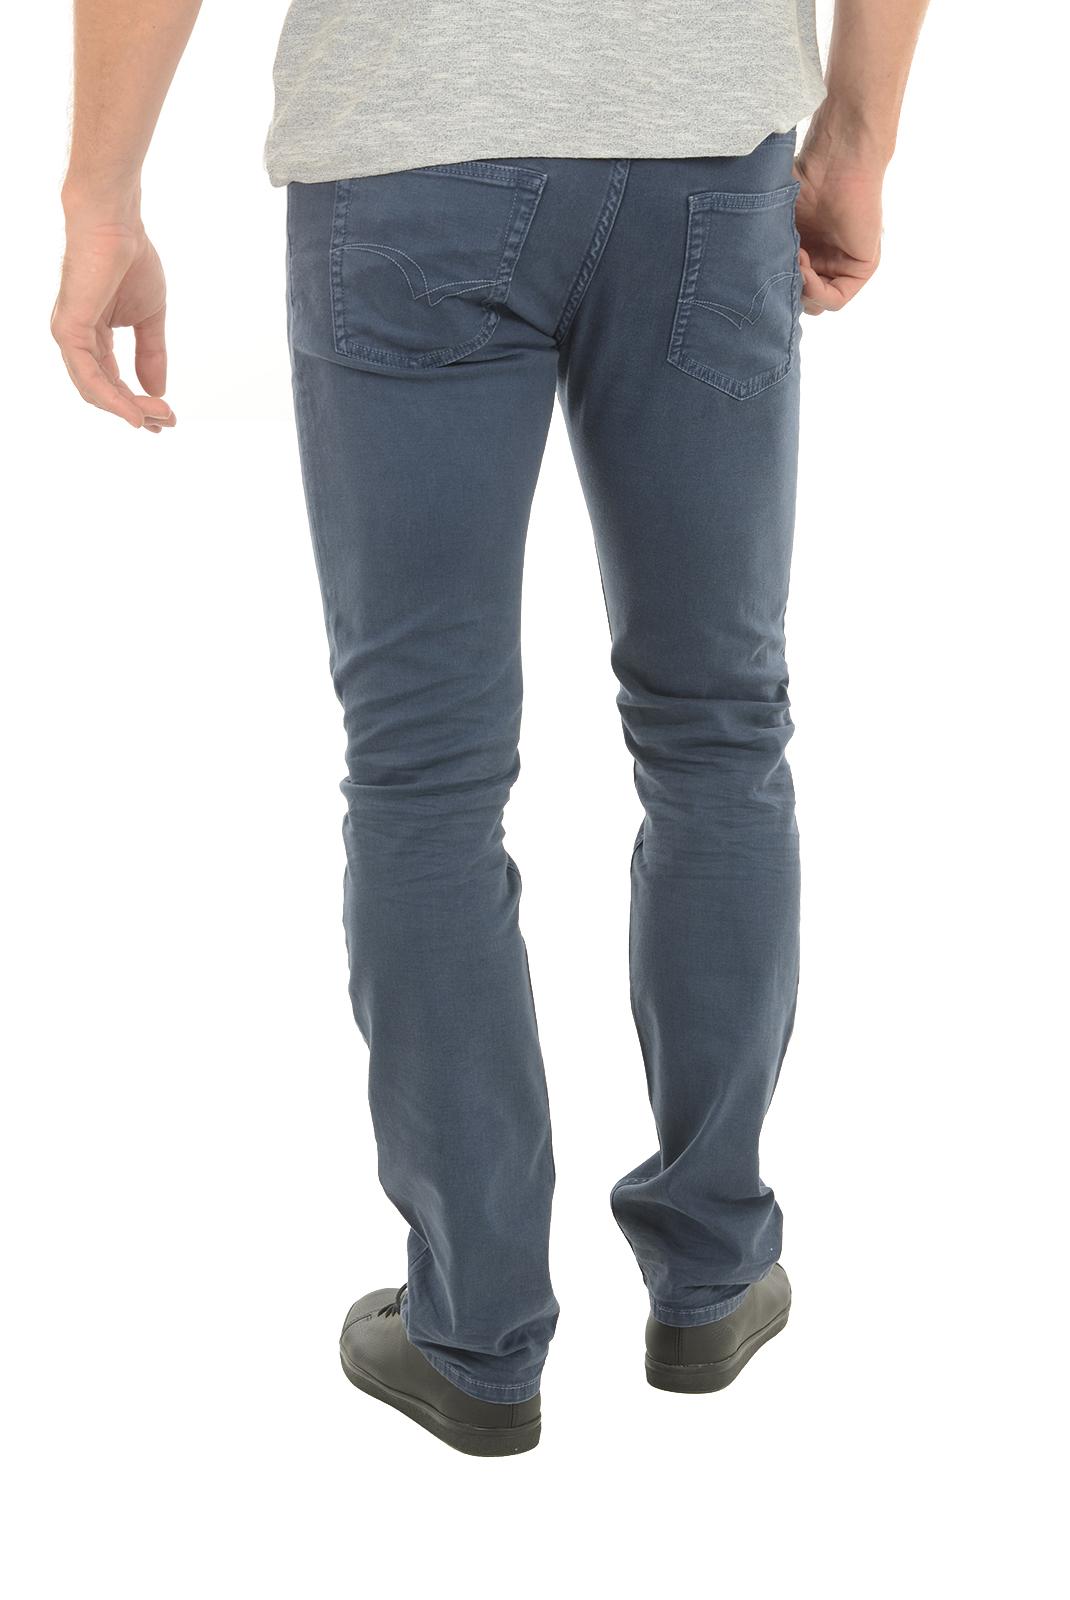 Pantalons chino/citadin  Lee cooper LC122ZP 7634 NAVY